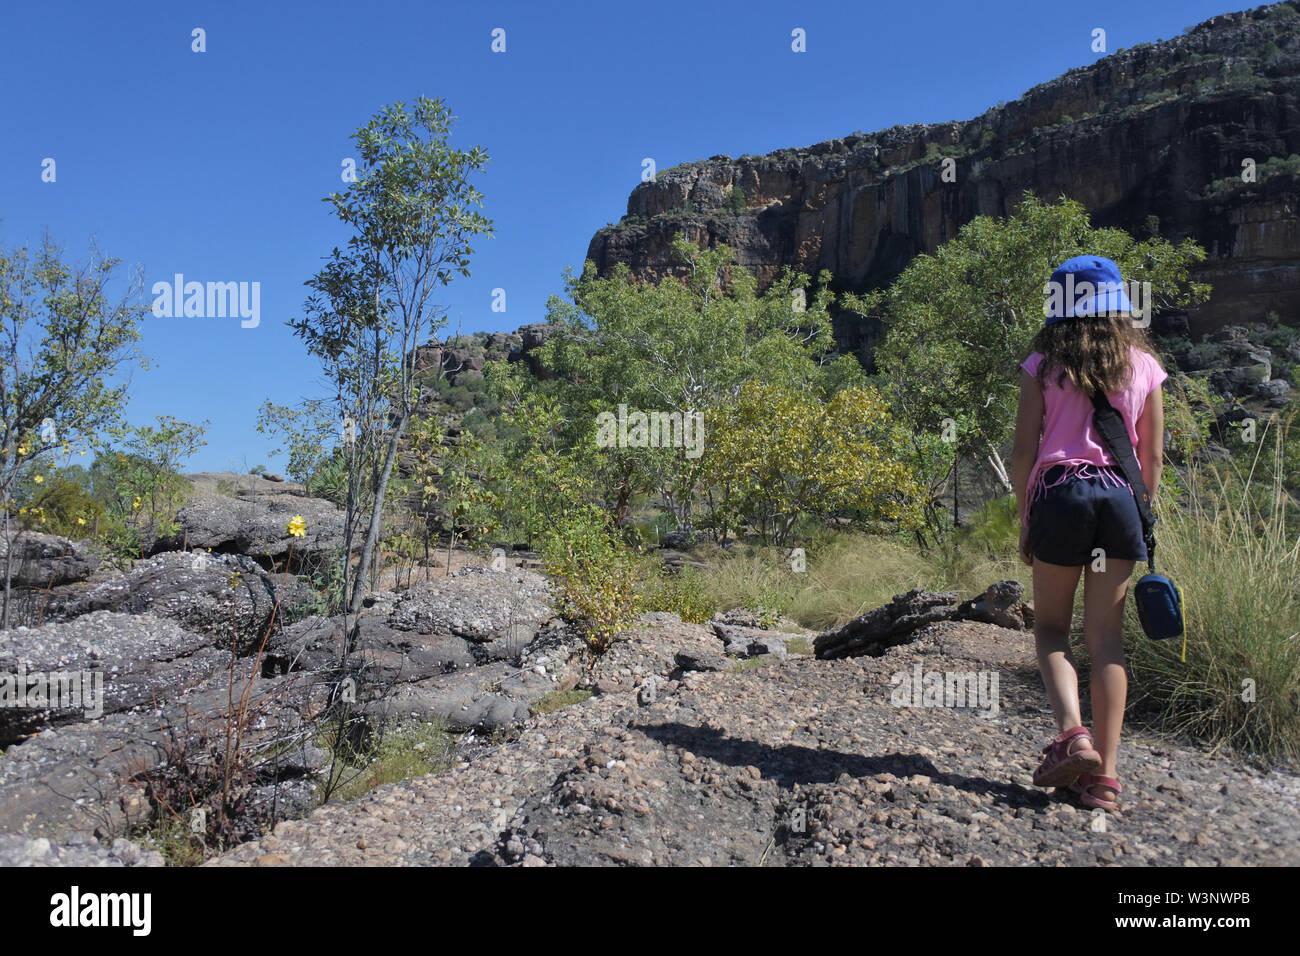 Young Australian girl (age 8-9) hiking at Burrungkuy Nourlangie rock art site in Kakadu National Park Northern Territory of Australia - Stock Image